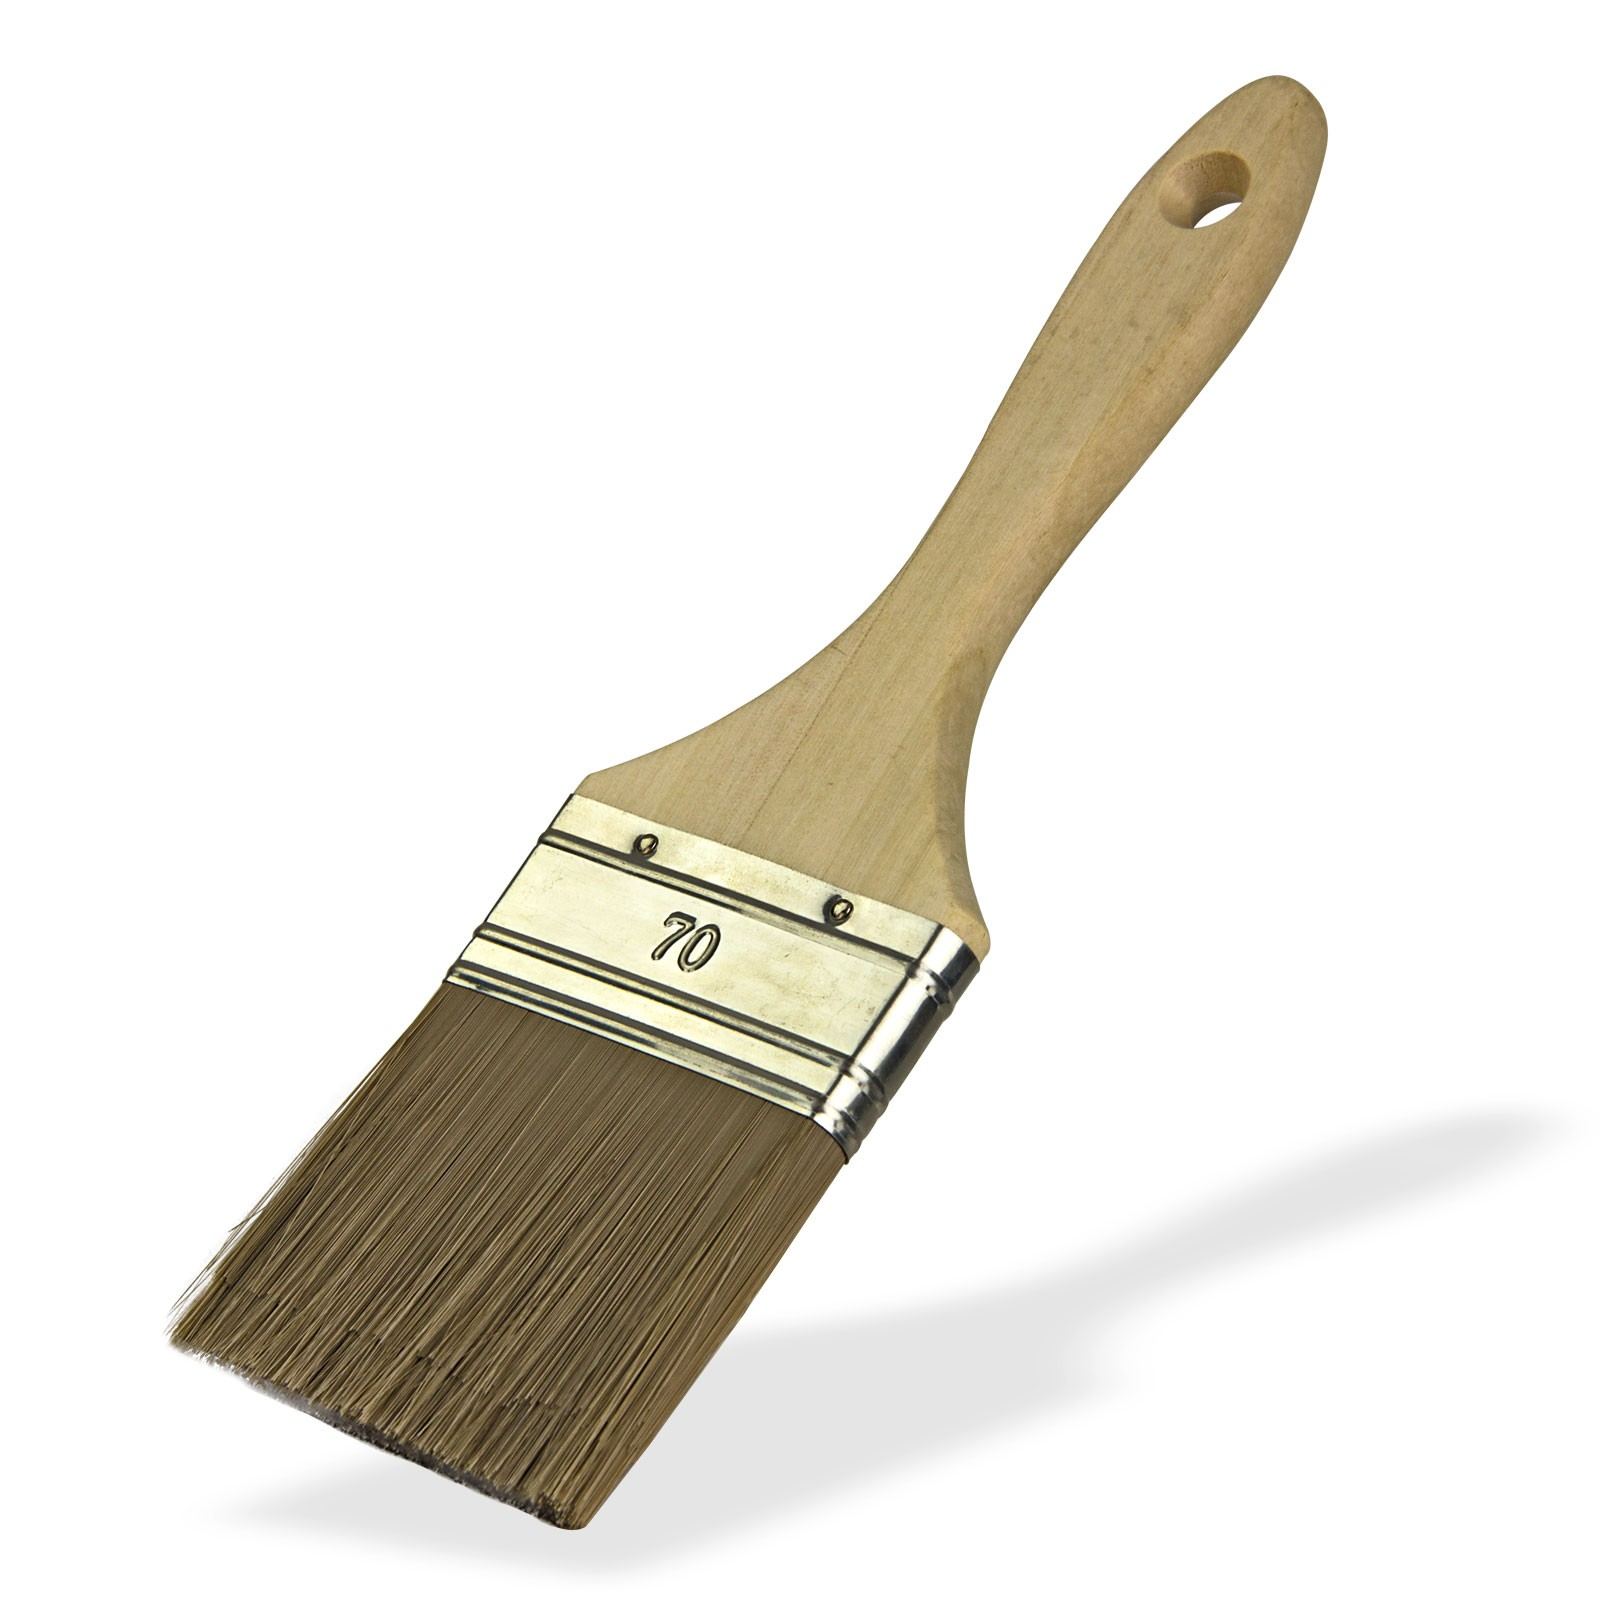 Dema Malerpinsel / Flachpinsel 70 mm 15326